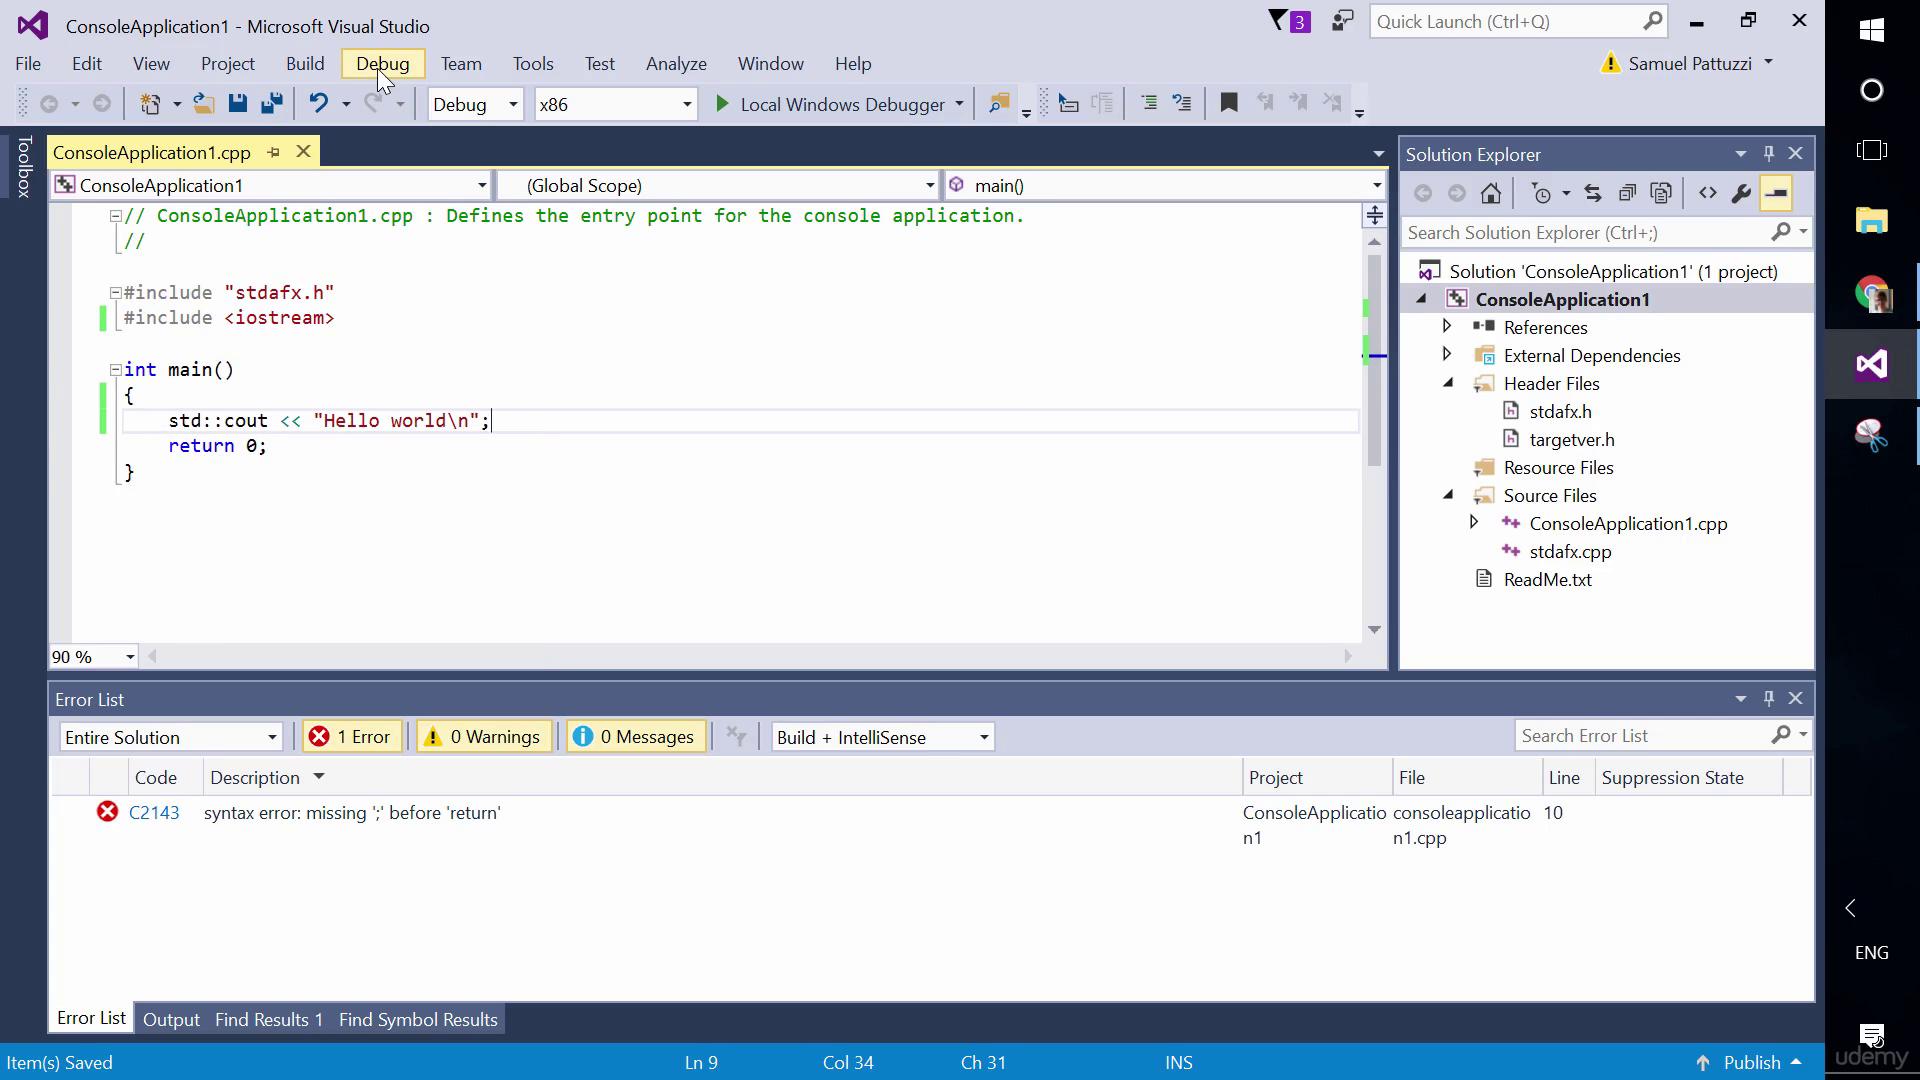 The Unreal Engine Developer Course - Learn C++ & Make Games